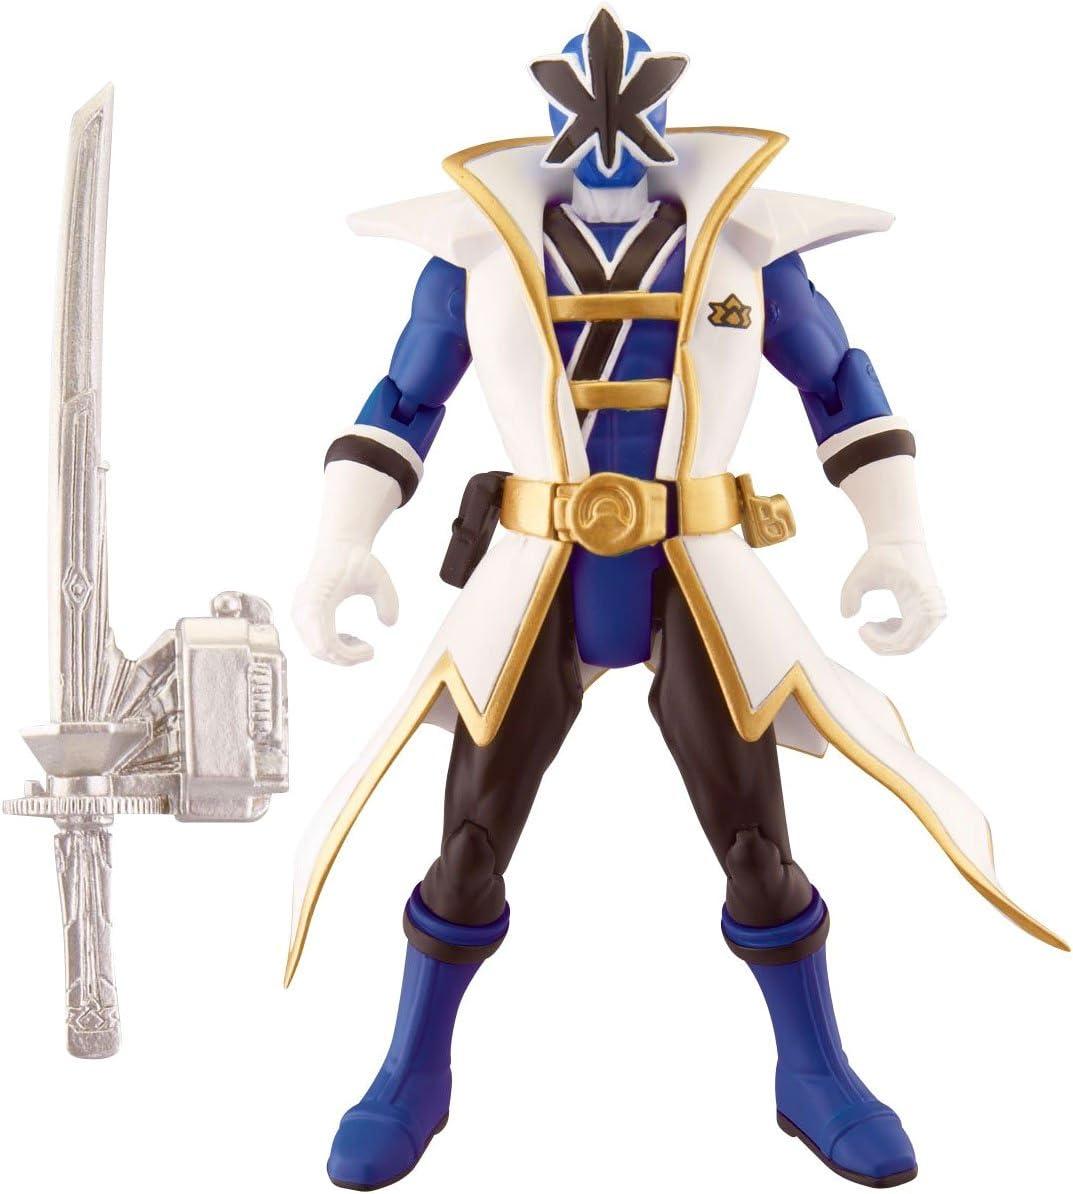 SUPER SAMURAI RANGER Action Figure 31702 Power Rangers Samurai 10cm BLUE WATER